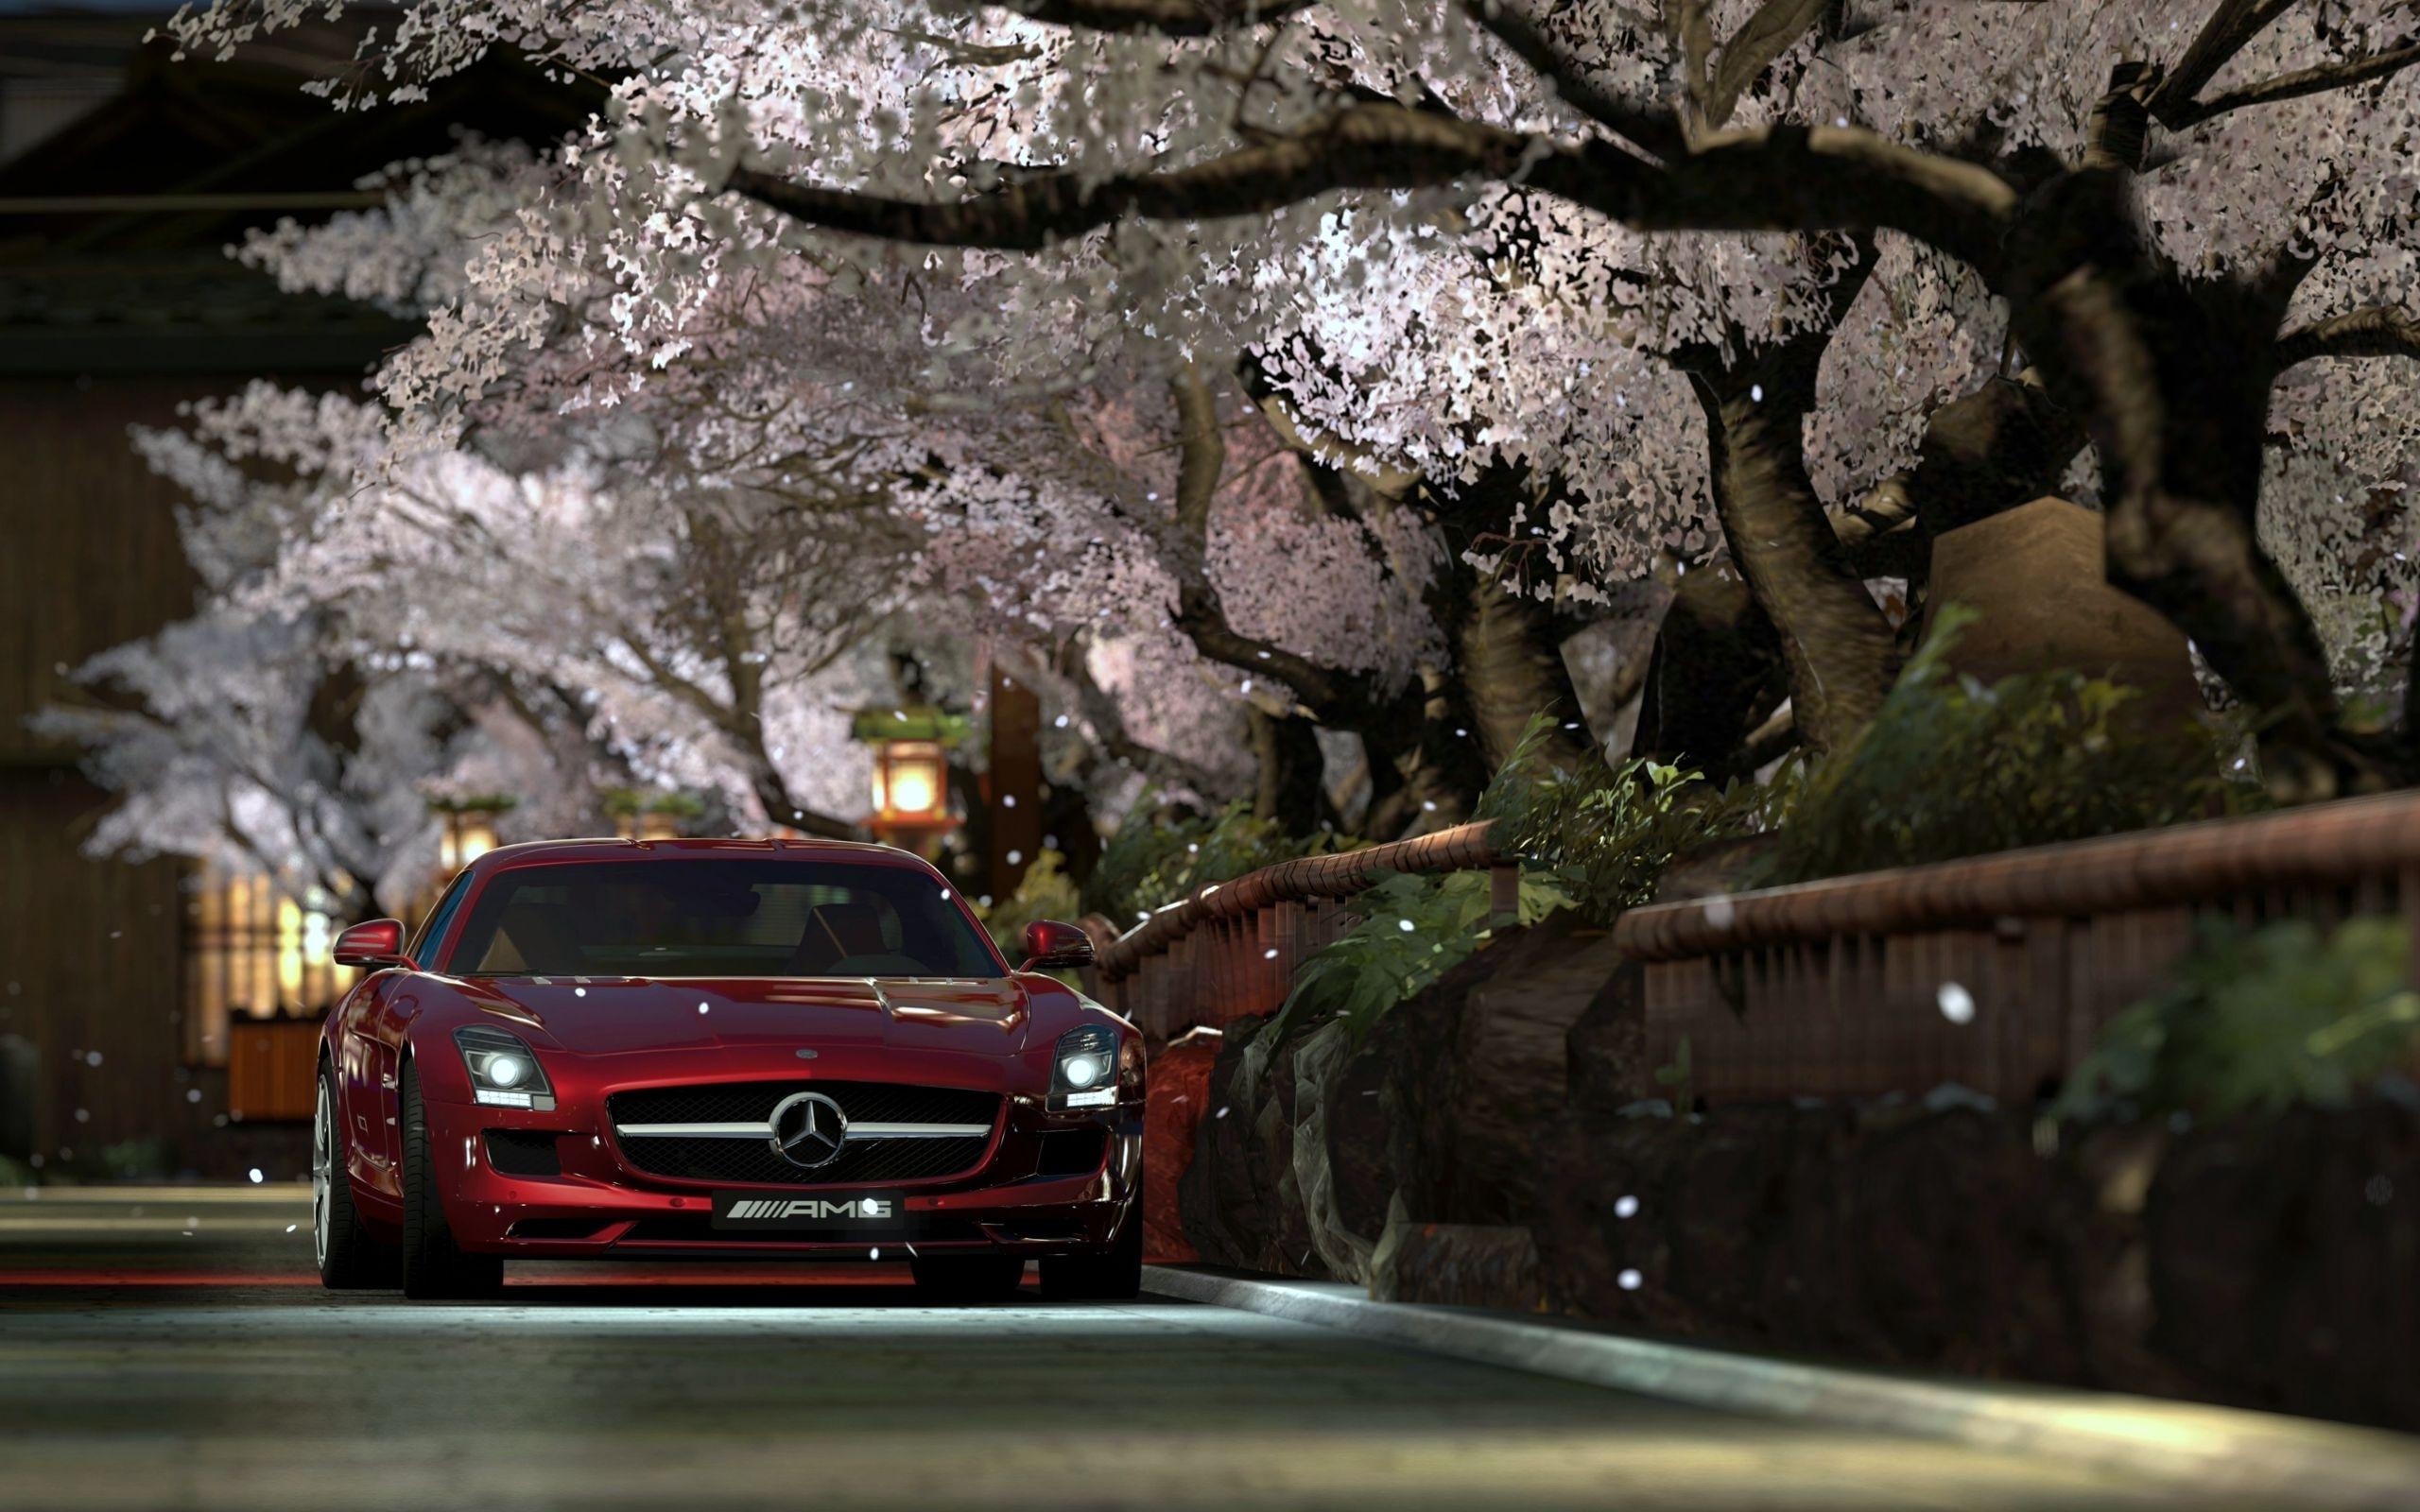 Descarga gratuita de fondo de pantalla para móvil de Transporte, Automóvil, Mercedes.